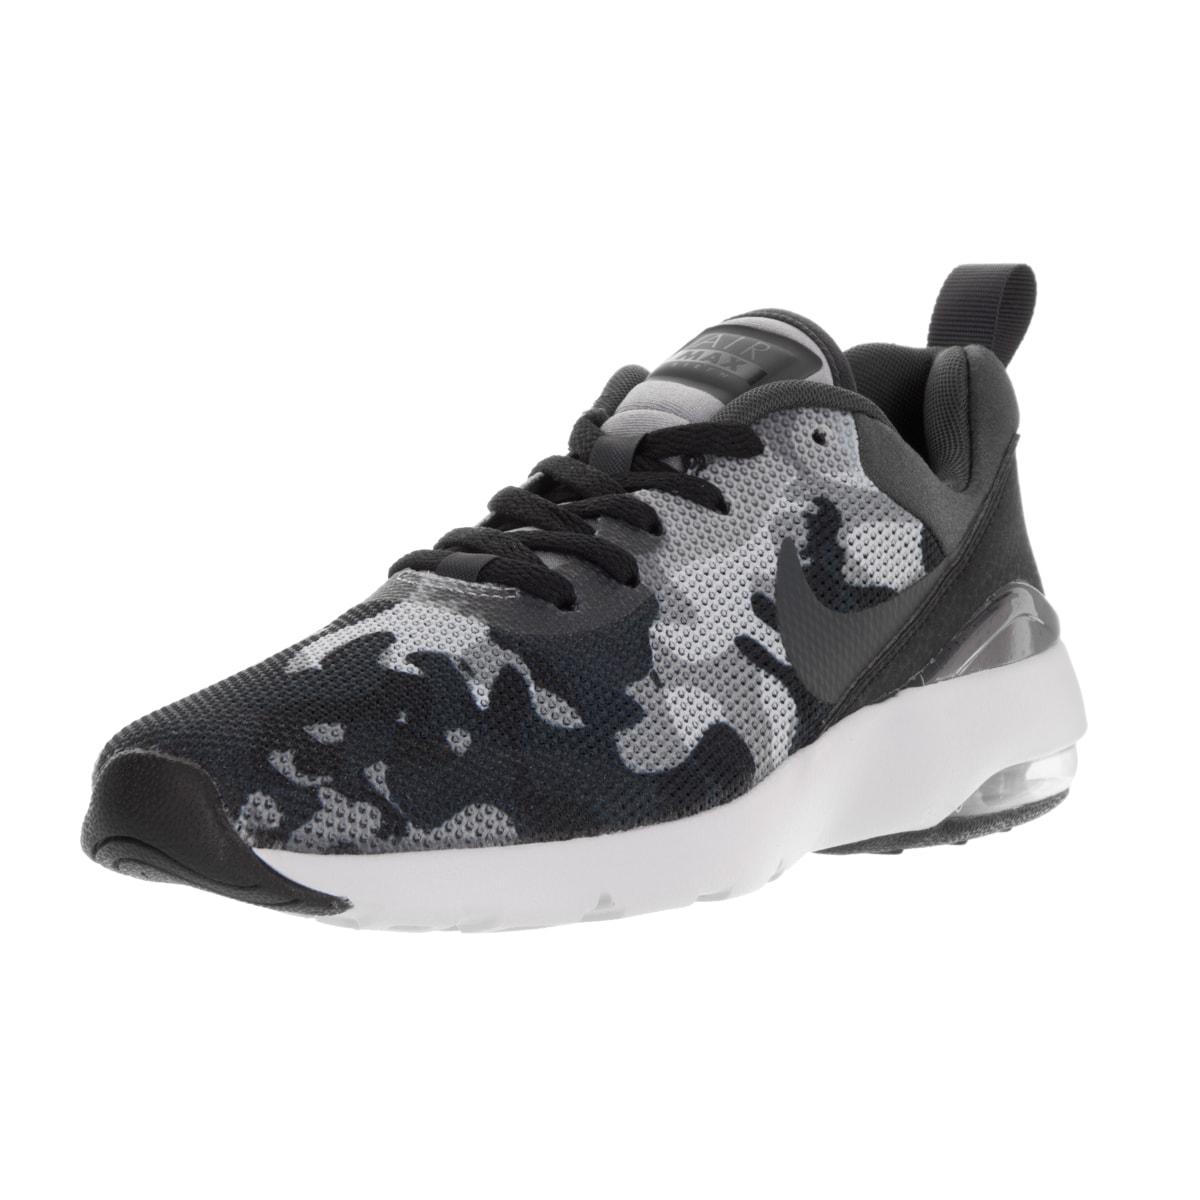 Nike Women's Air Max Siren Print Black/Anthracite/Wolf Gr...